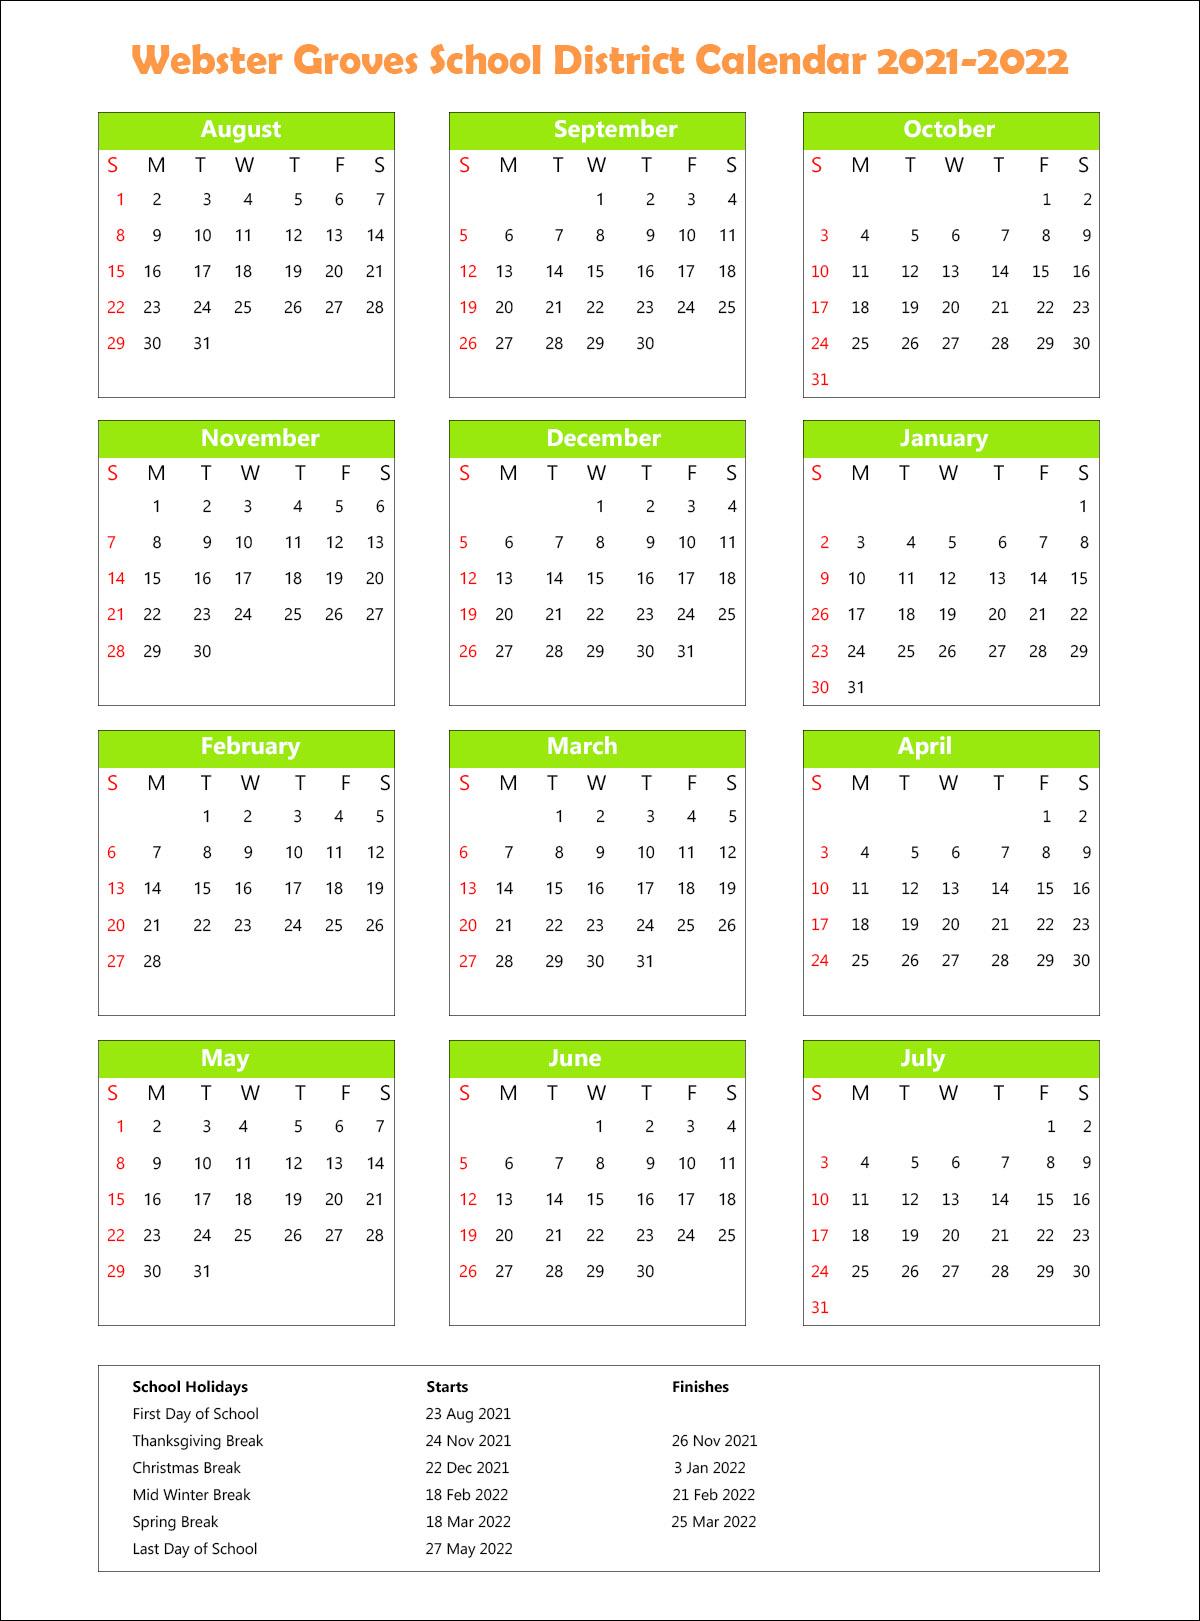 Webster Groves School District, Missouri Calendar Holidays 2021